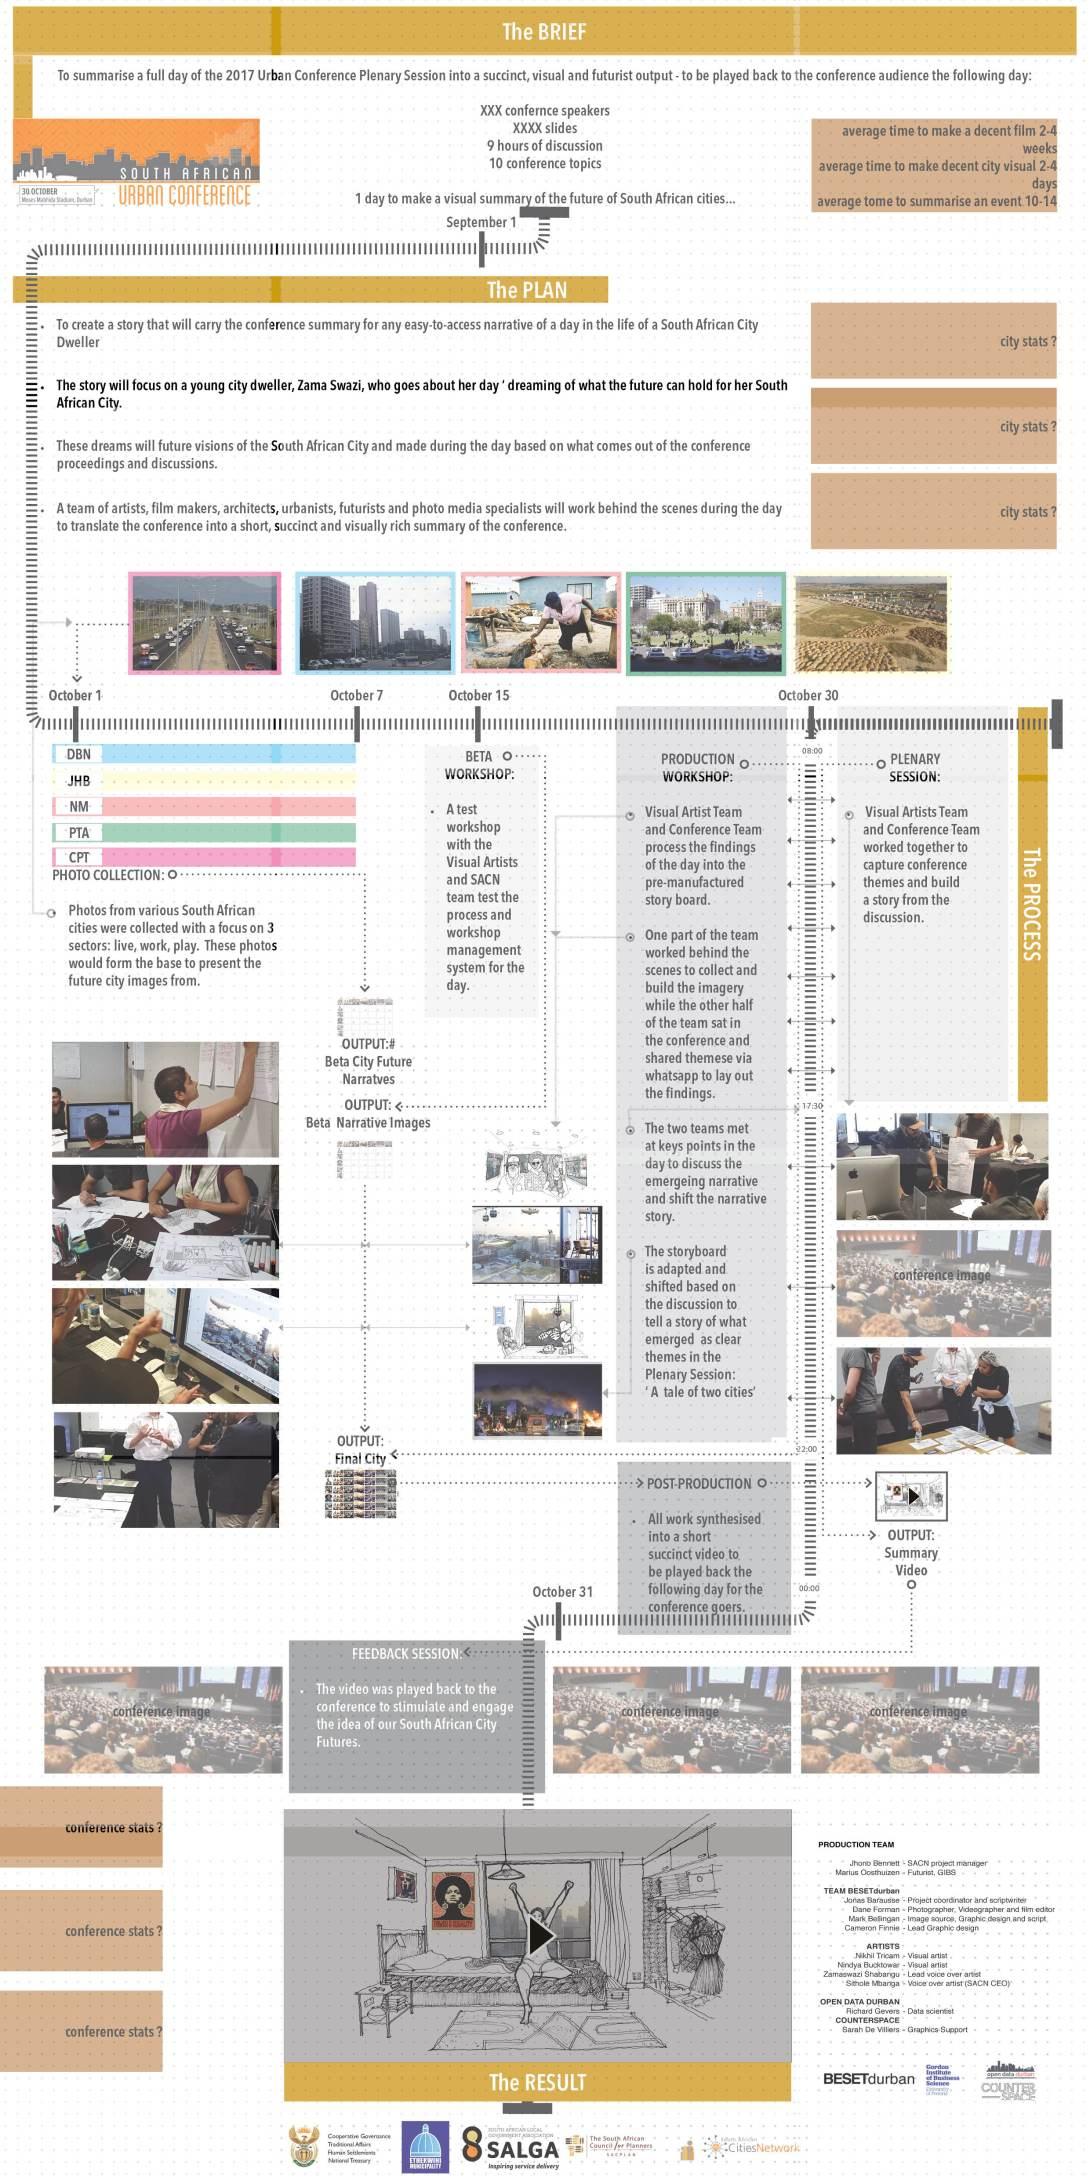 CityFuture_Method Summary_draft 12